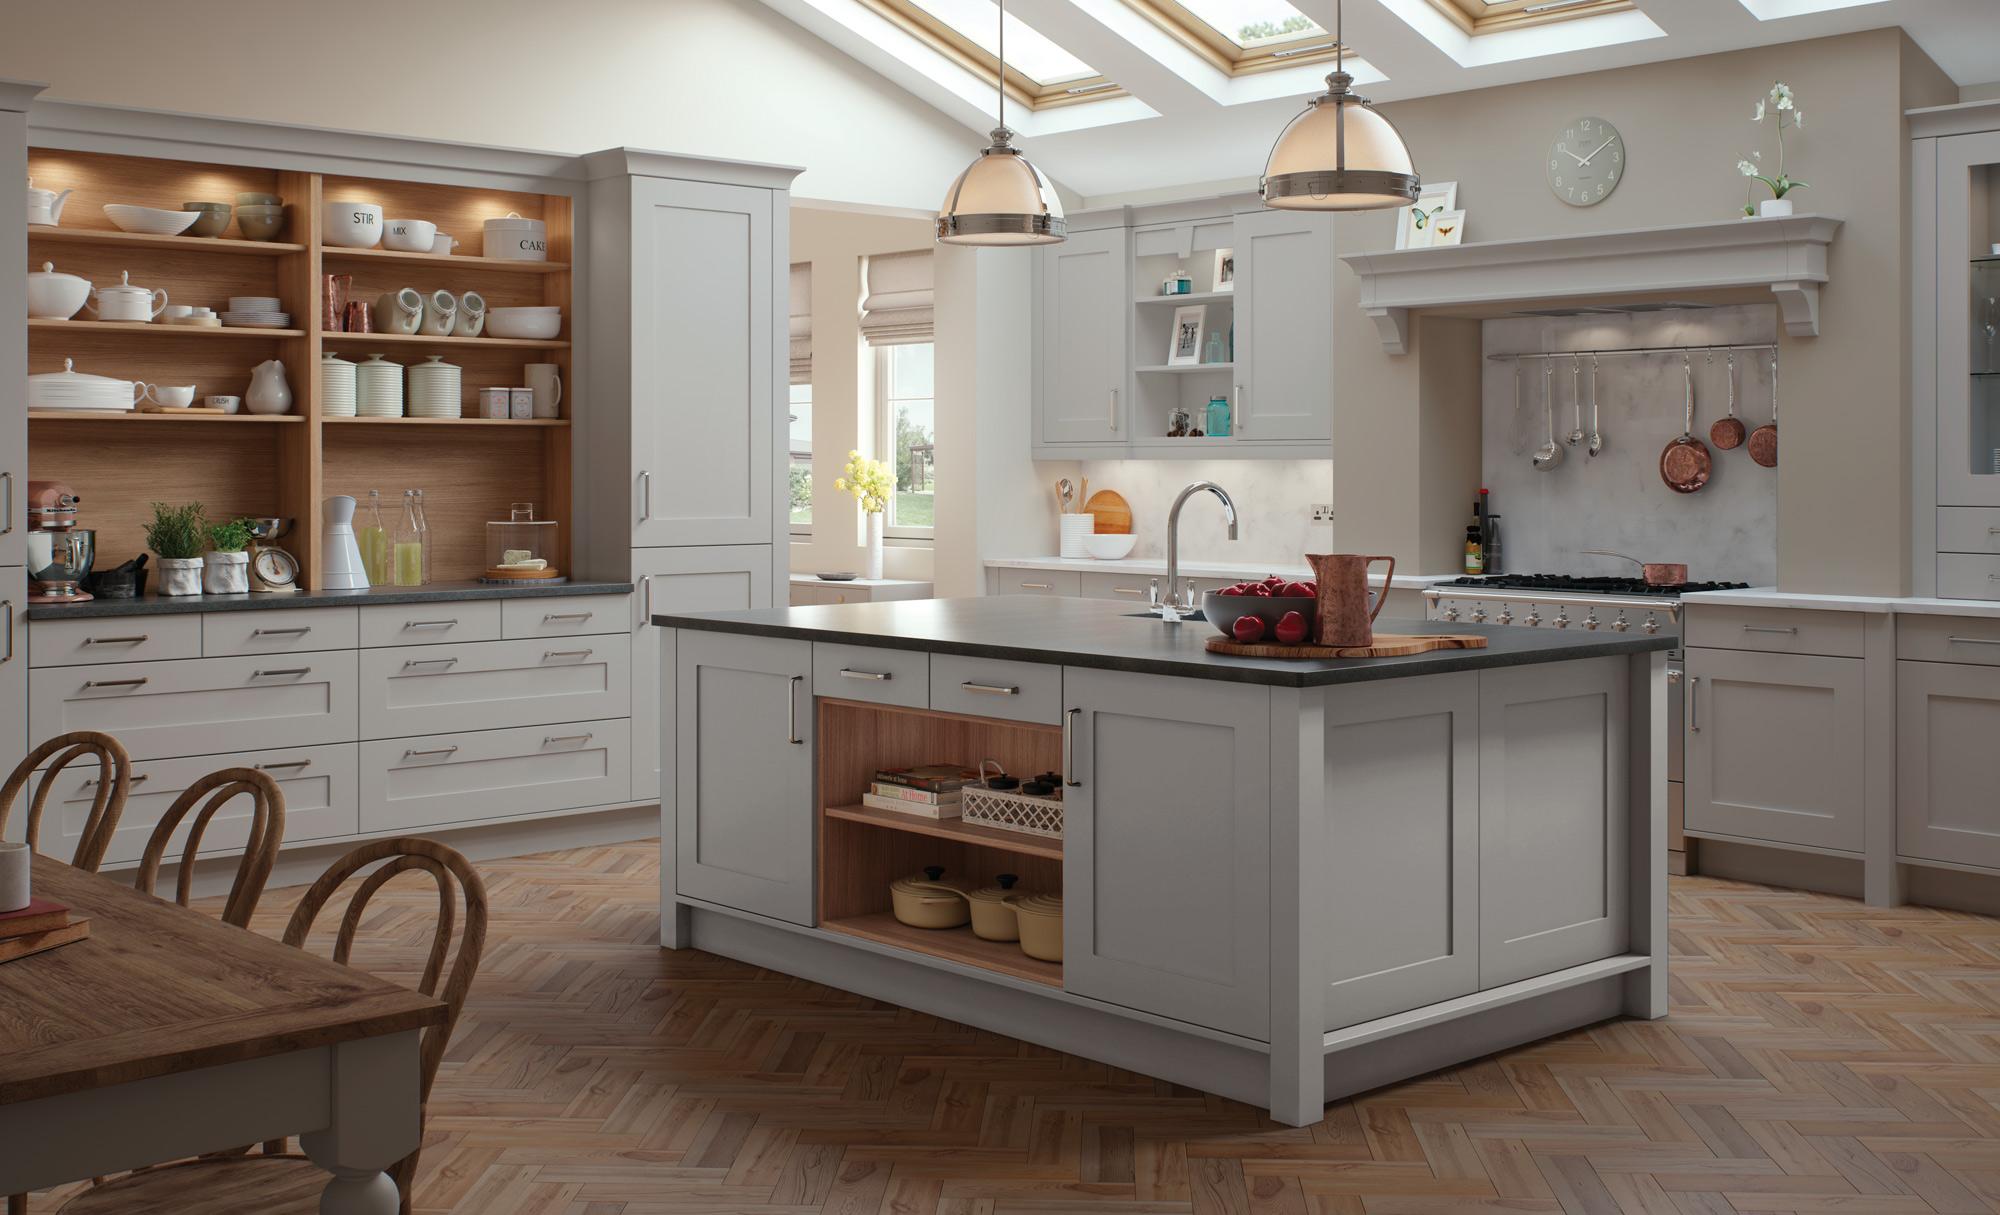 Modern Contemporary Classic Kitchen - Georgia Painted Light Grey Kitchen - Kitchen Design - Alan Kelly Kitchens - Waterford